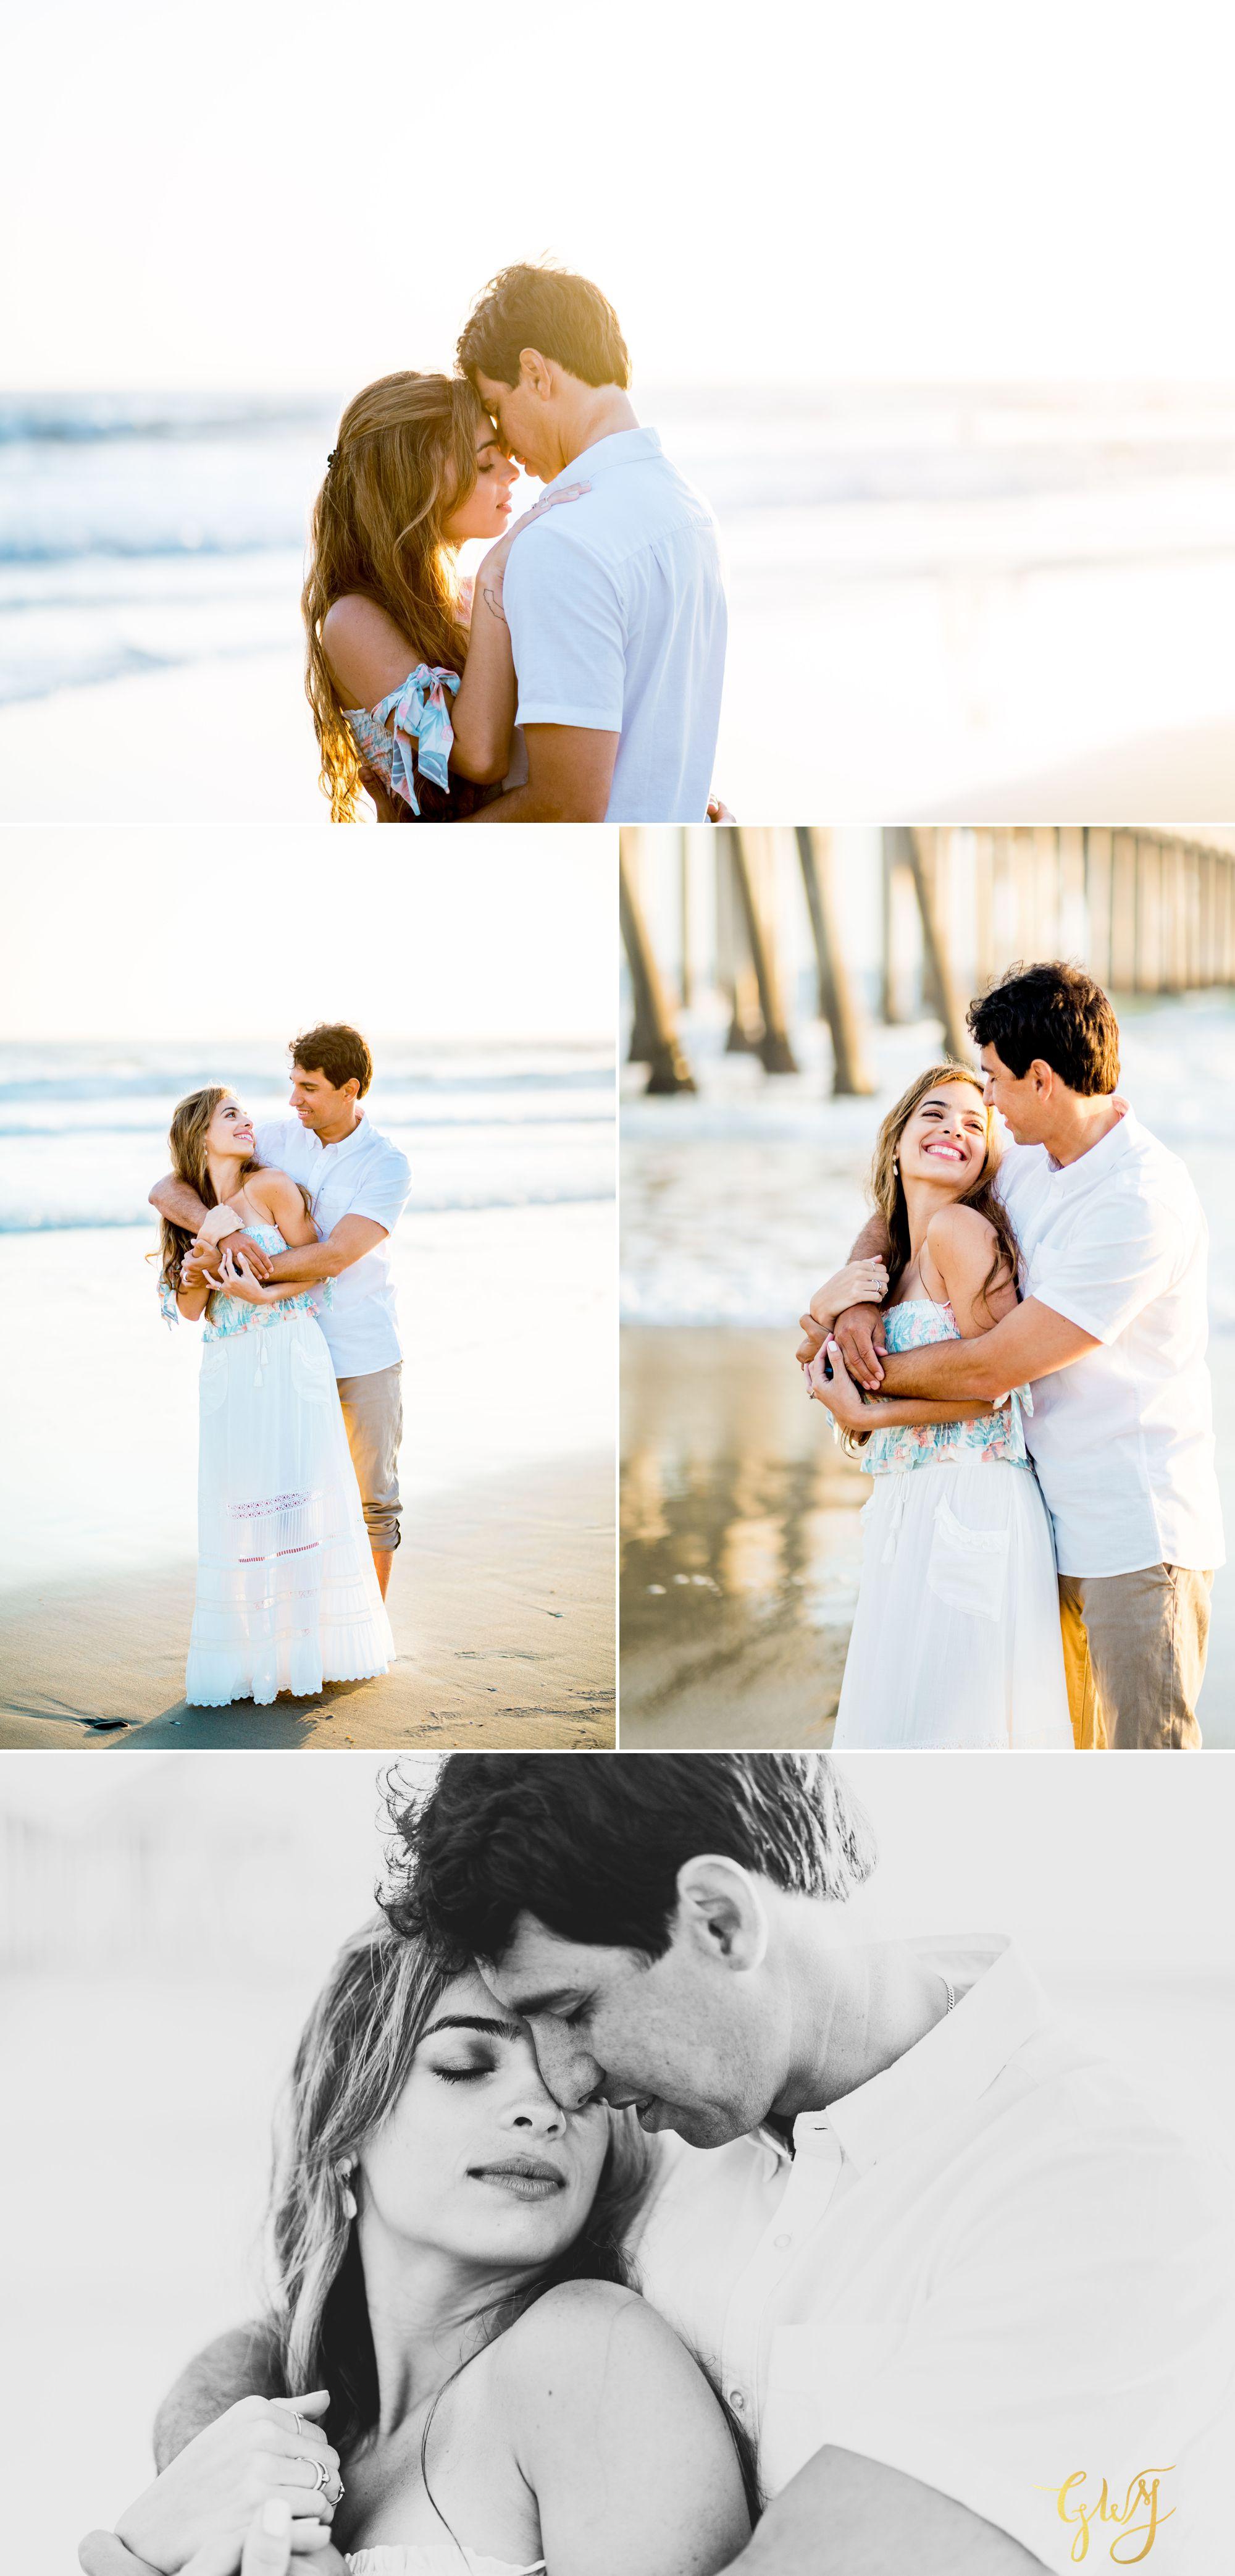 Felipe + Isabella Huntington Beach Summer Sunset Engagement Session by Glass Woods Media 20.jpg